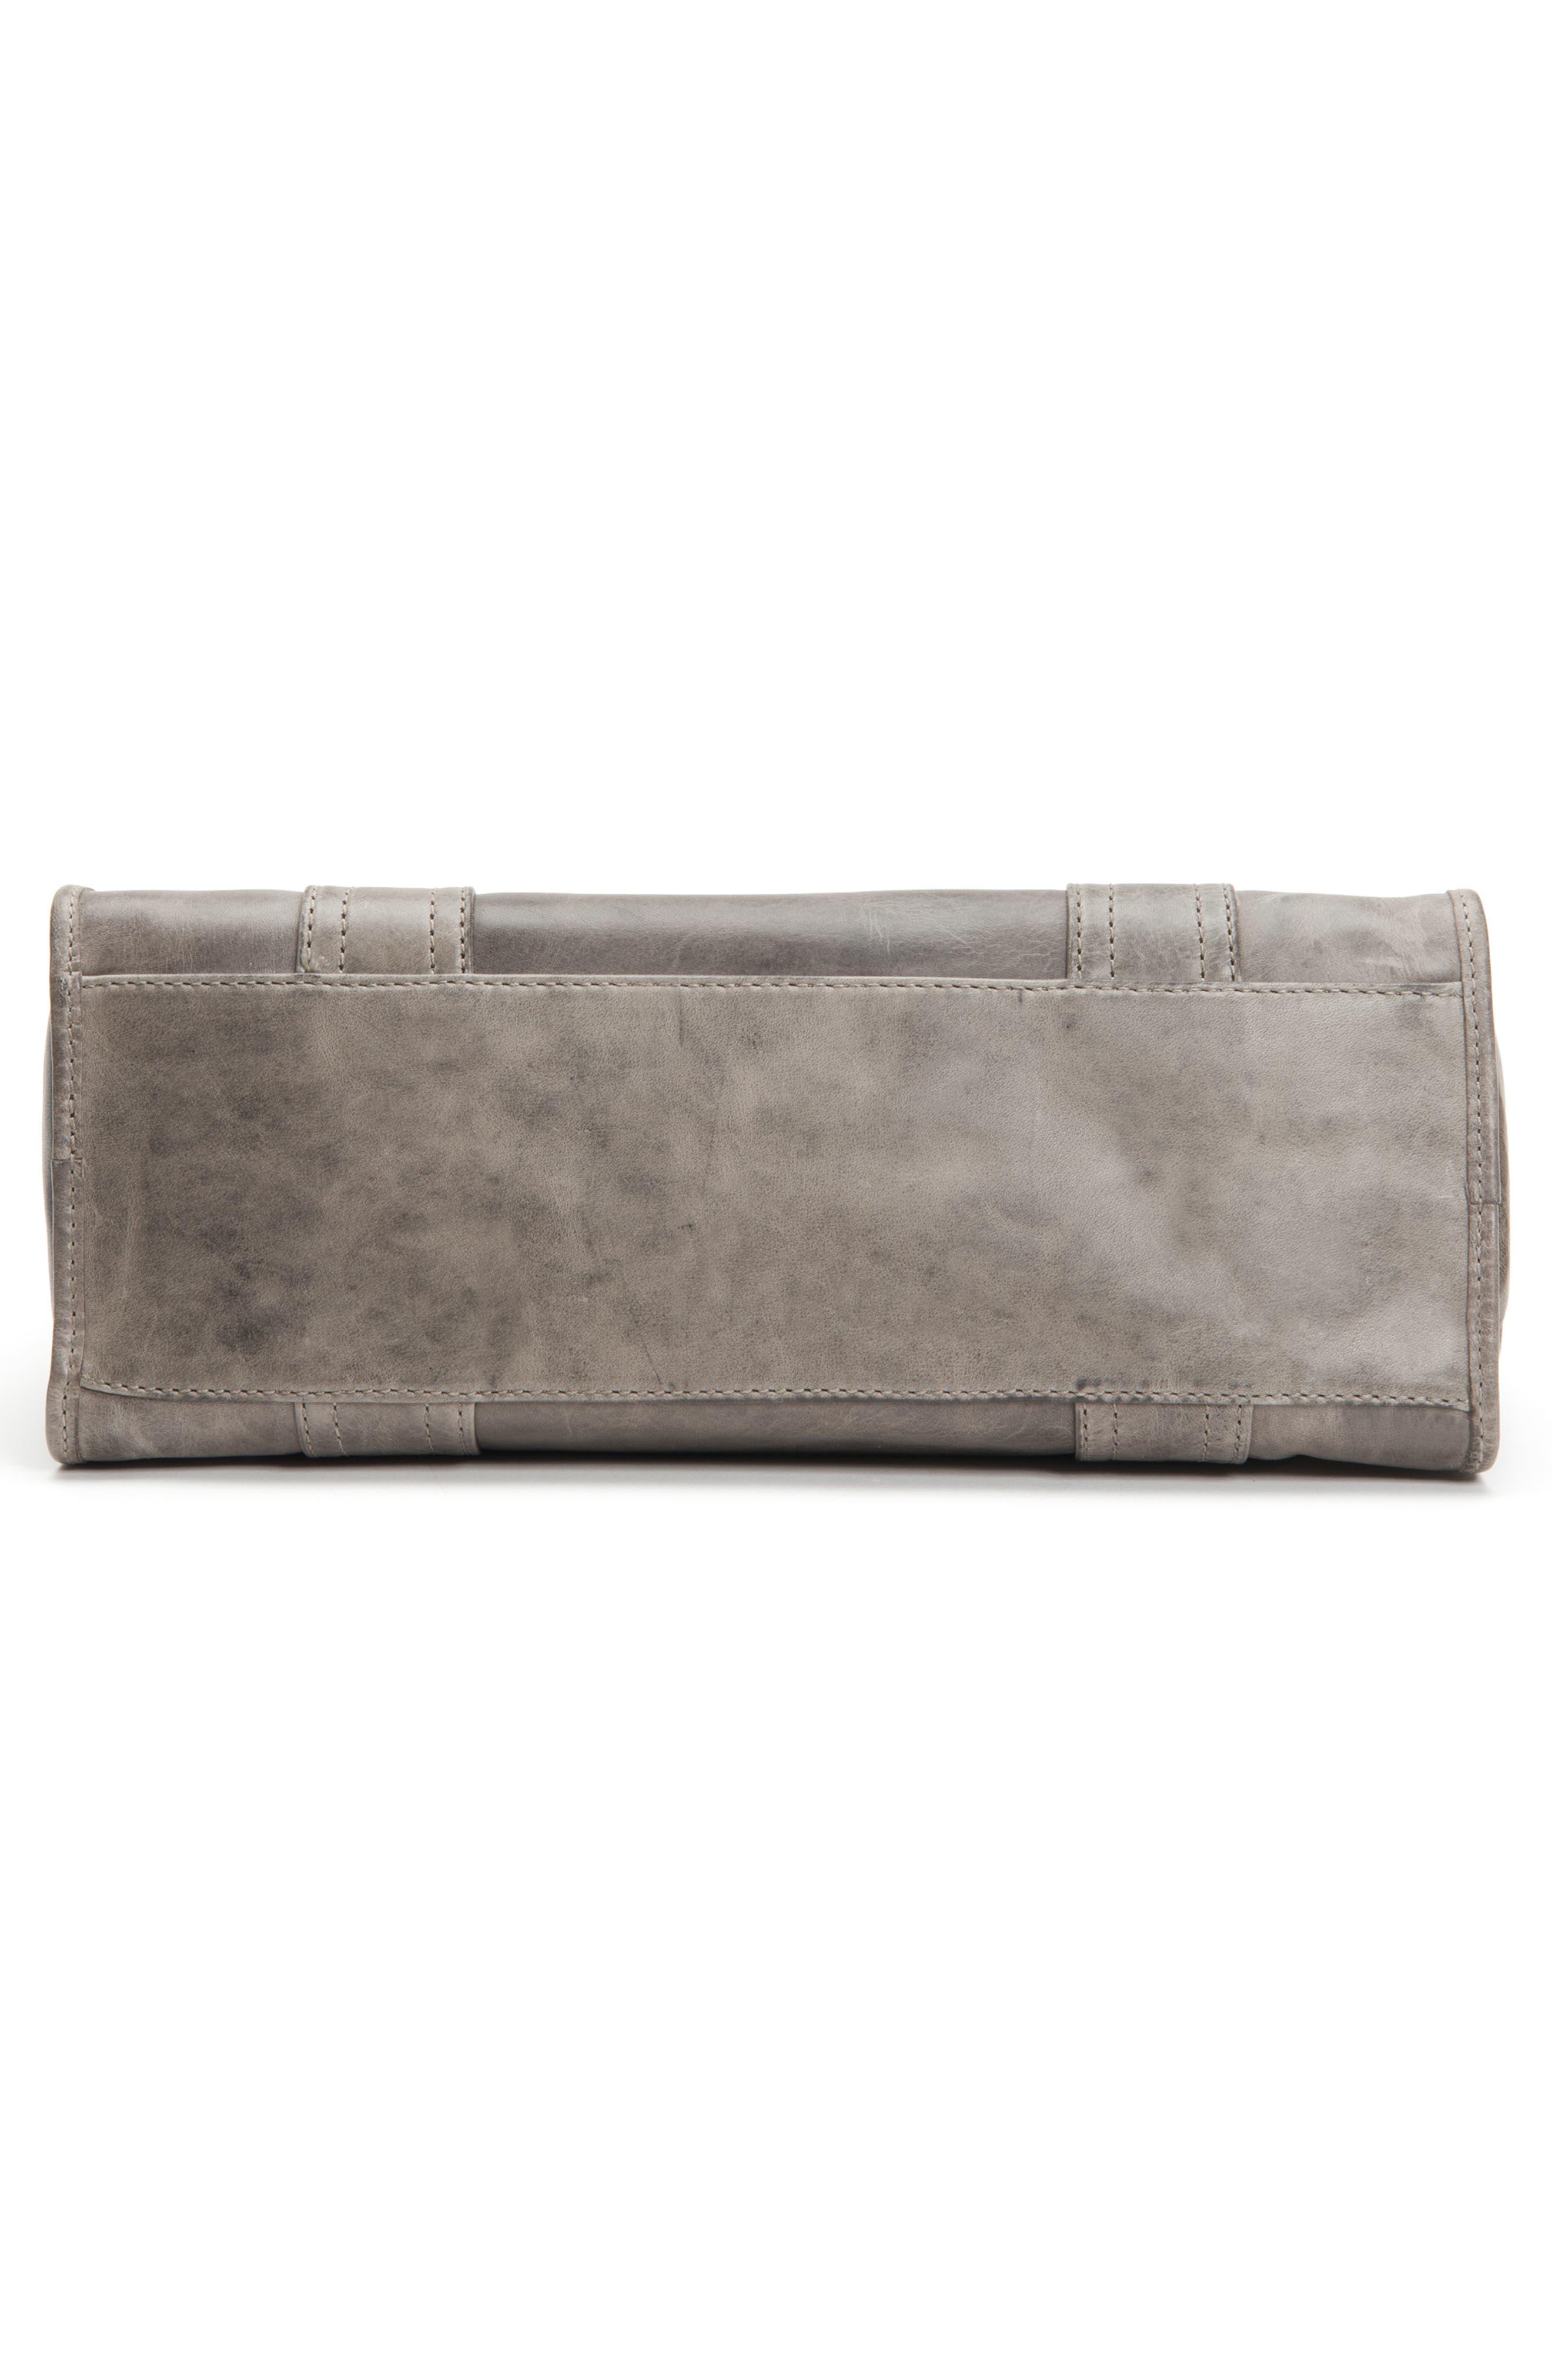 FRYE,                             'Melissa' Washed Leather Satchel,                             Alternate thumbnail 7, color,                             ICE